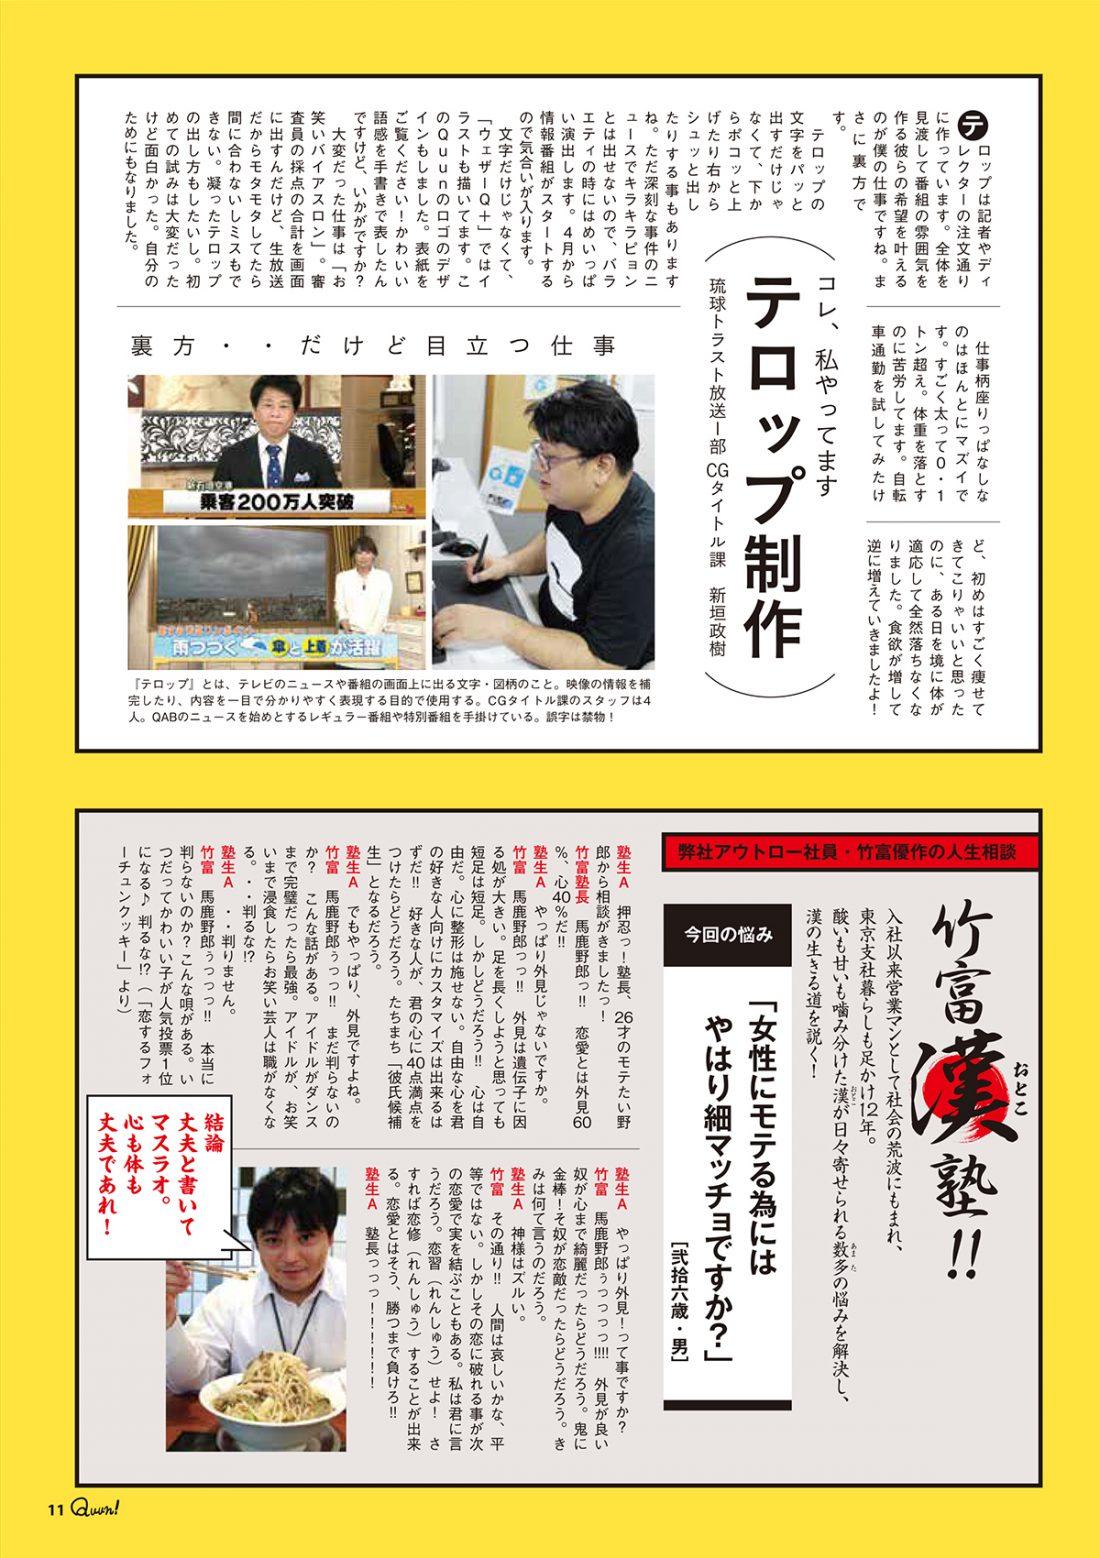 https://www.qab.co.jp/qgoro/wp-content/uploads/quun_0113-1100x1558.jpg